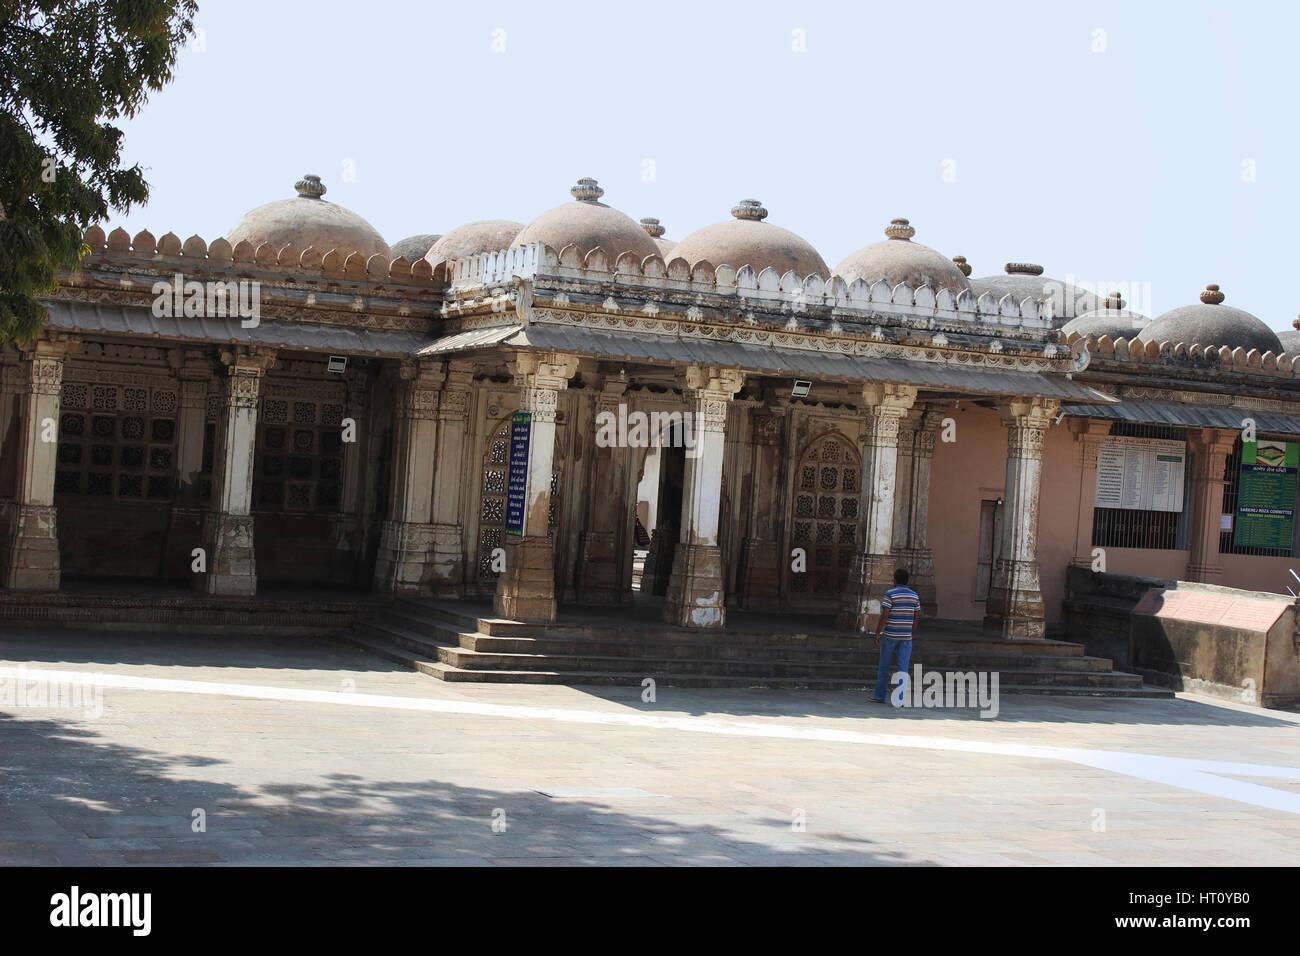 Entrance towards the east mausoleum containing the tombs, Sarkhej Roza, Makarba, Ahmedabad in Gujarat India. - Stock Image